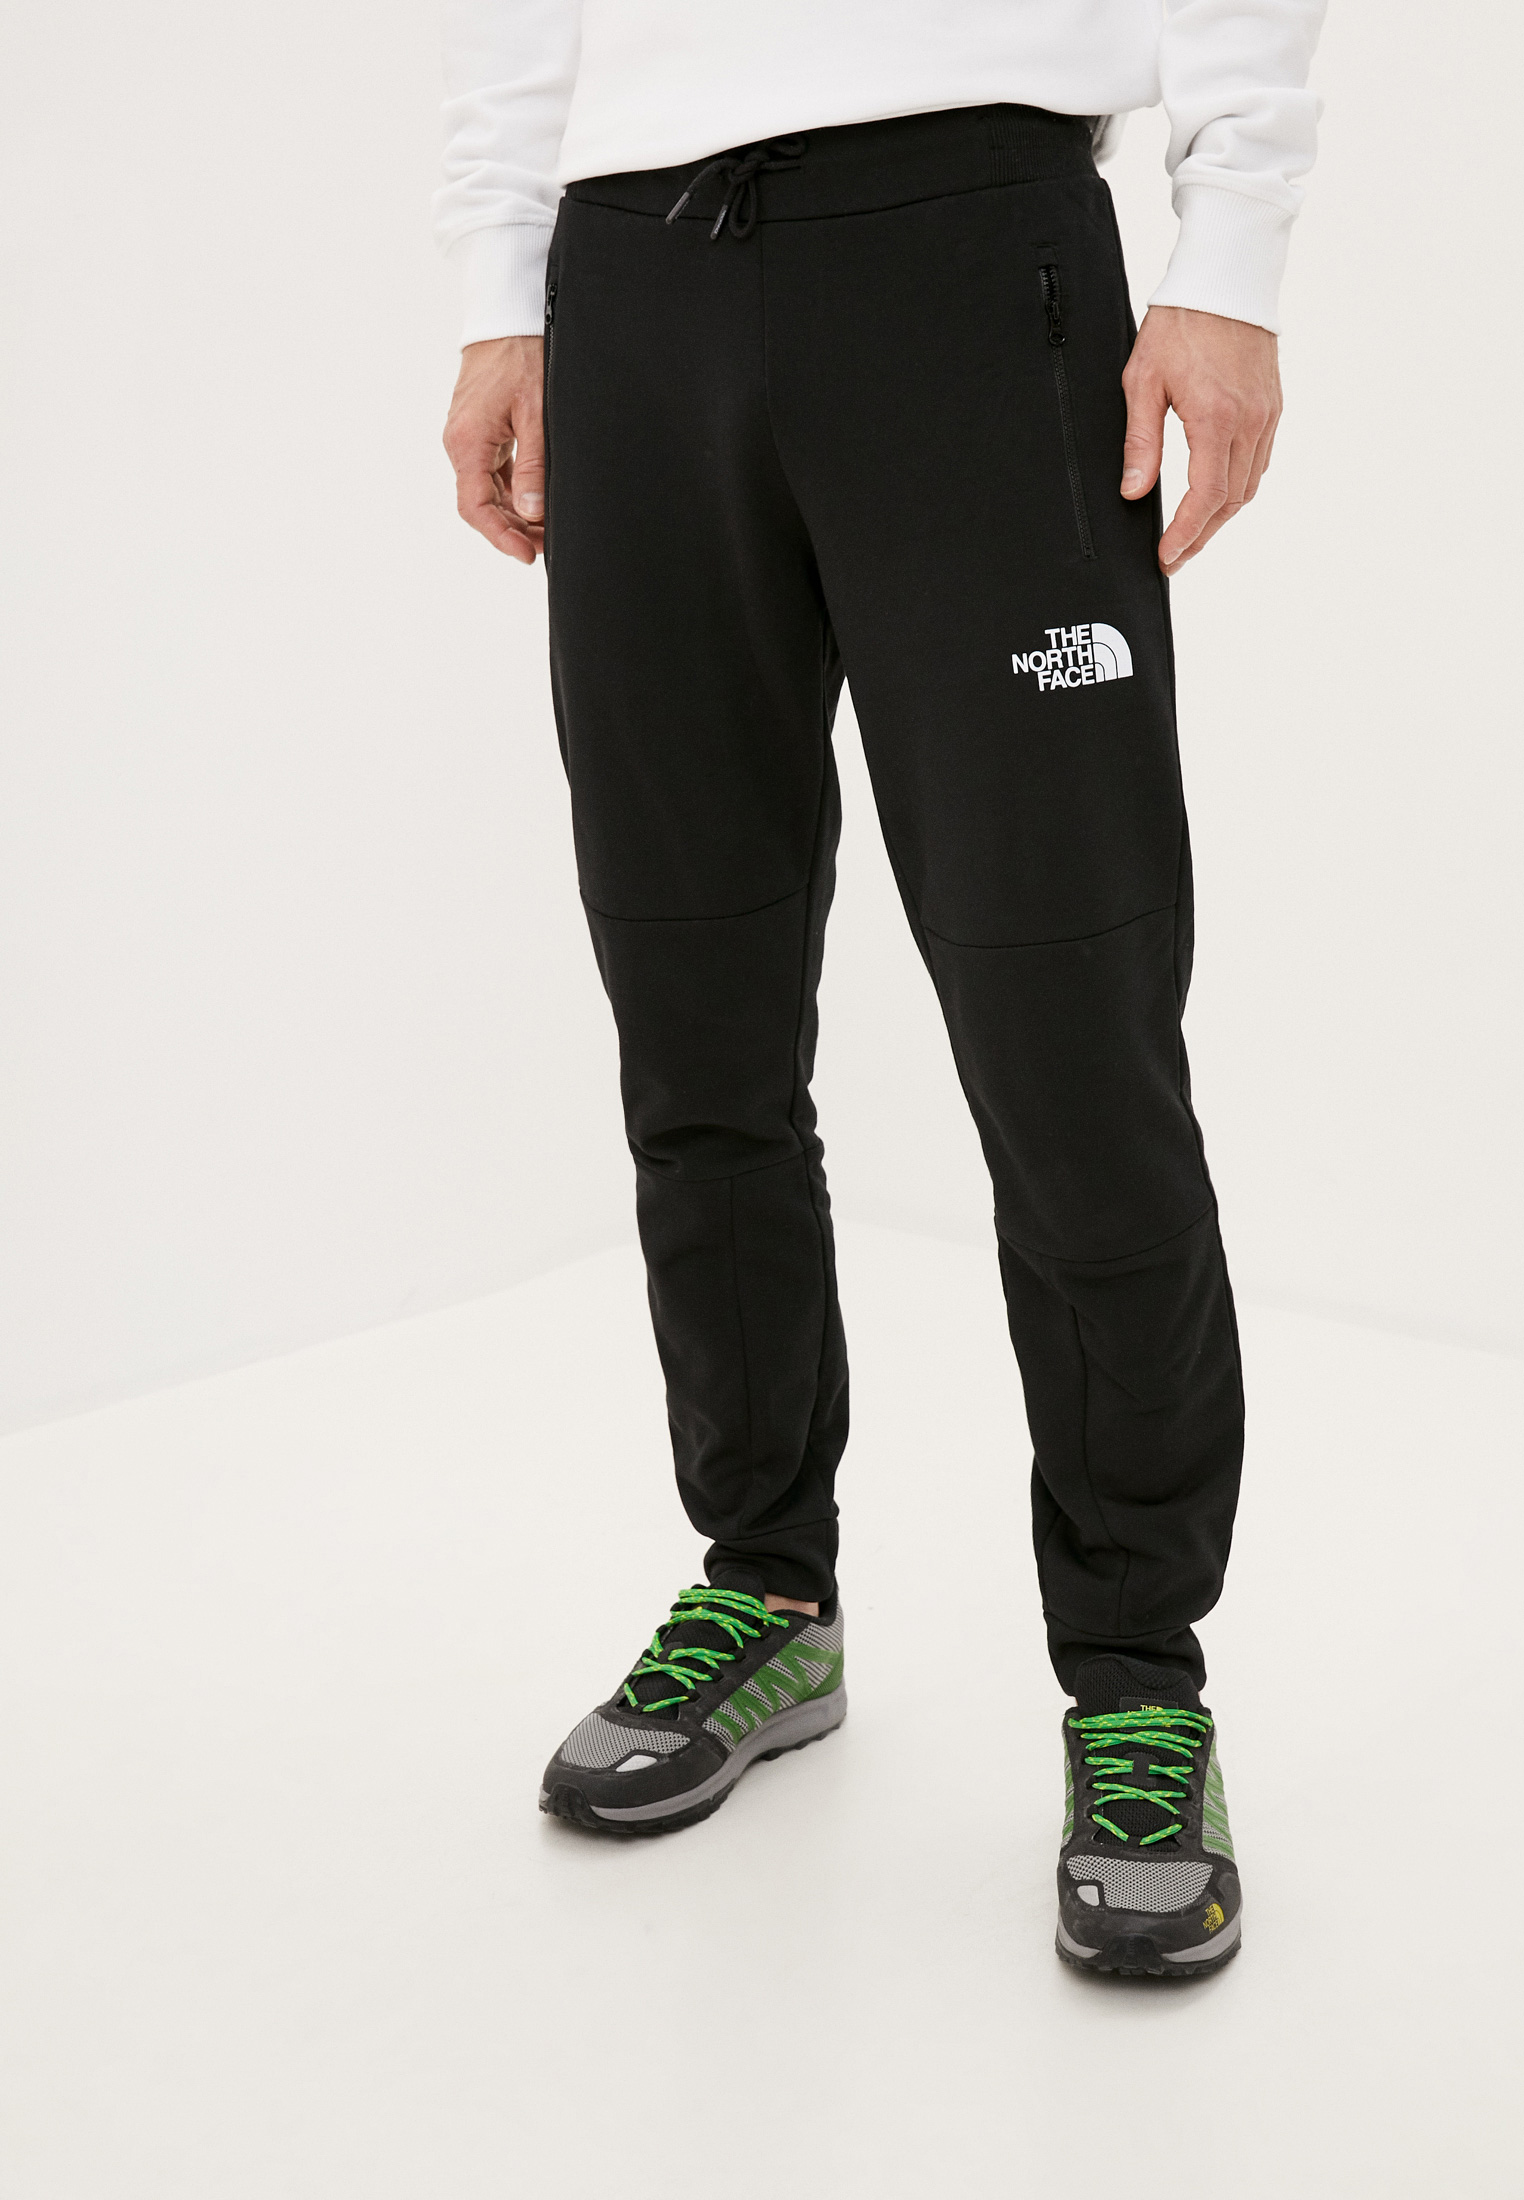 Мужские спортивные брюки The North Face (Норт Фейс) TA4SWO